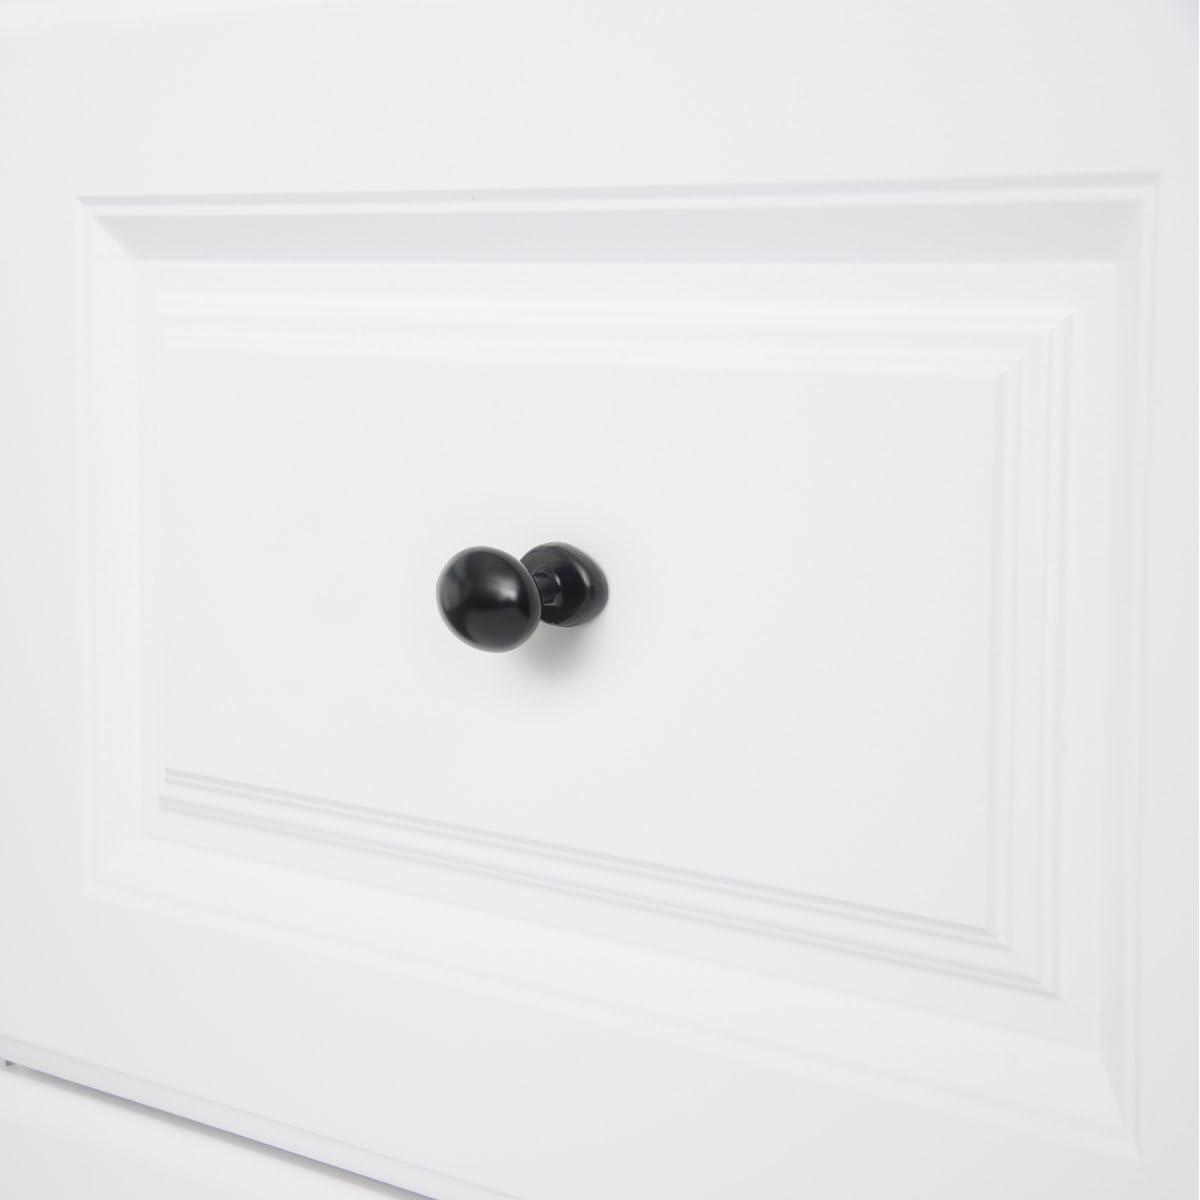 Chrome poli Basics Bouton de placard Ovale Diam/ètre : 3,59 cm Lot de 10